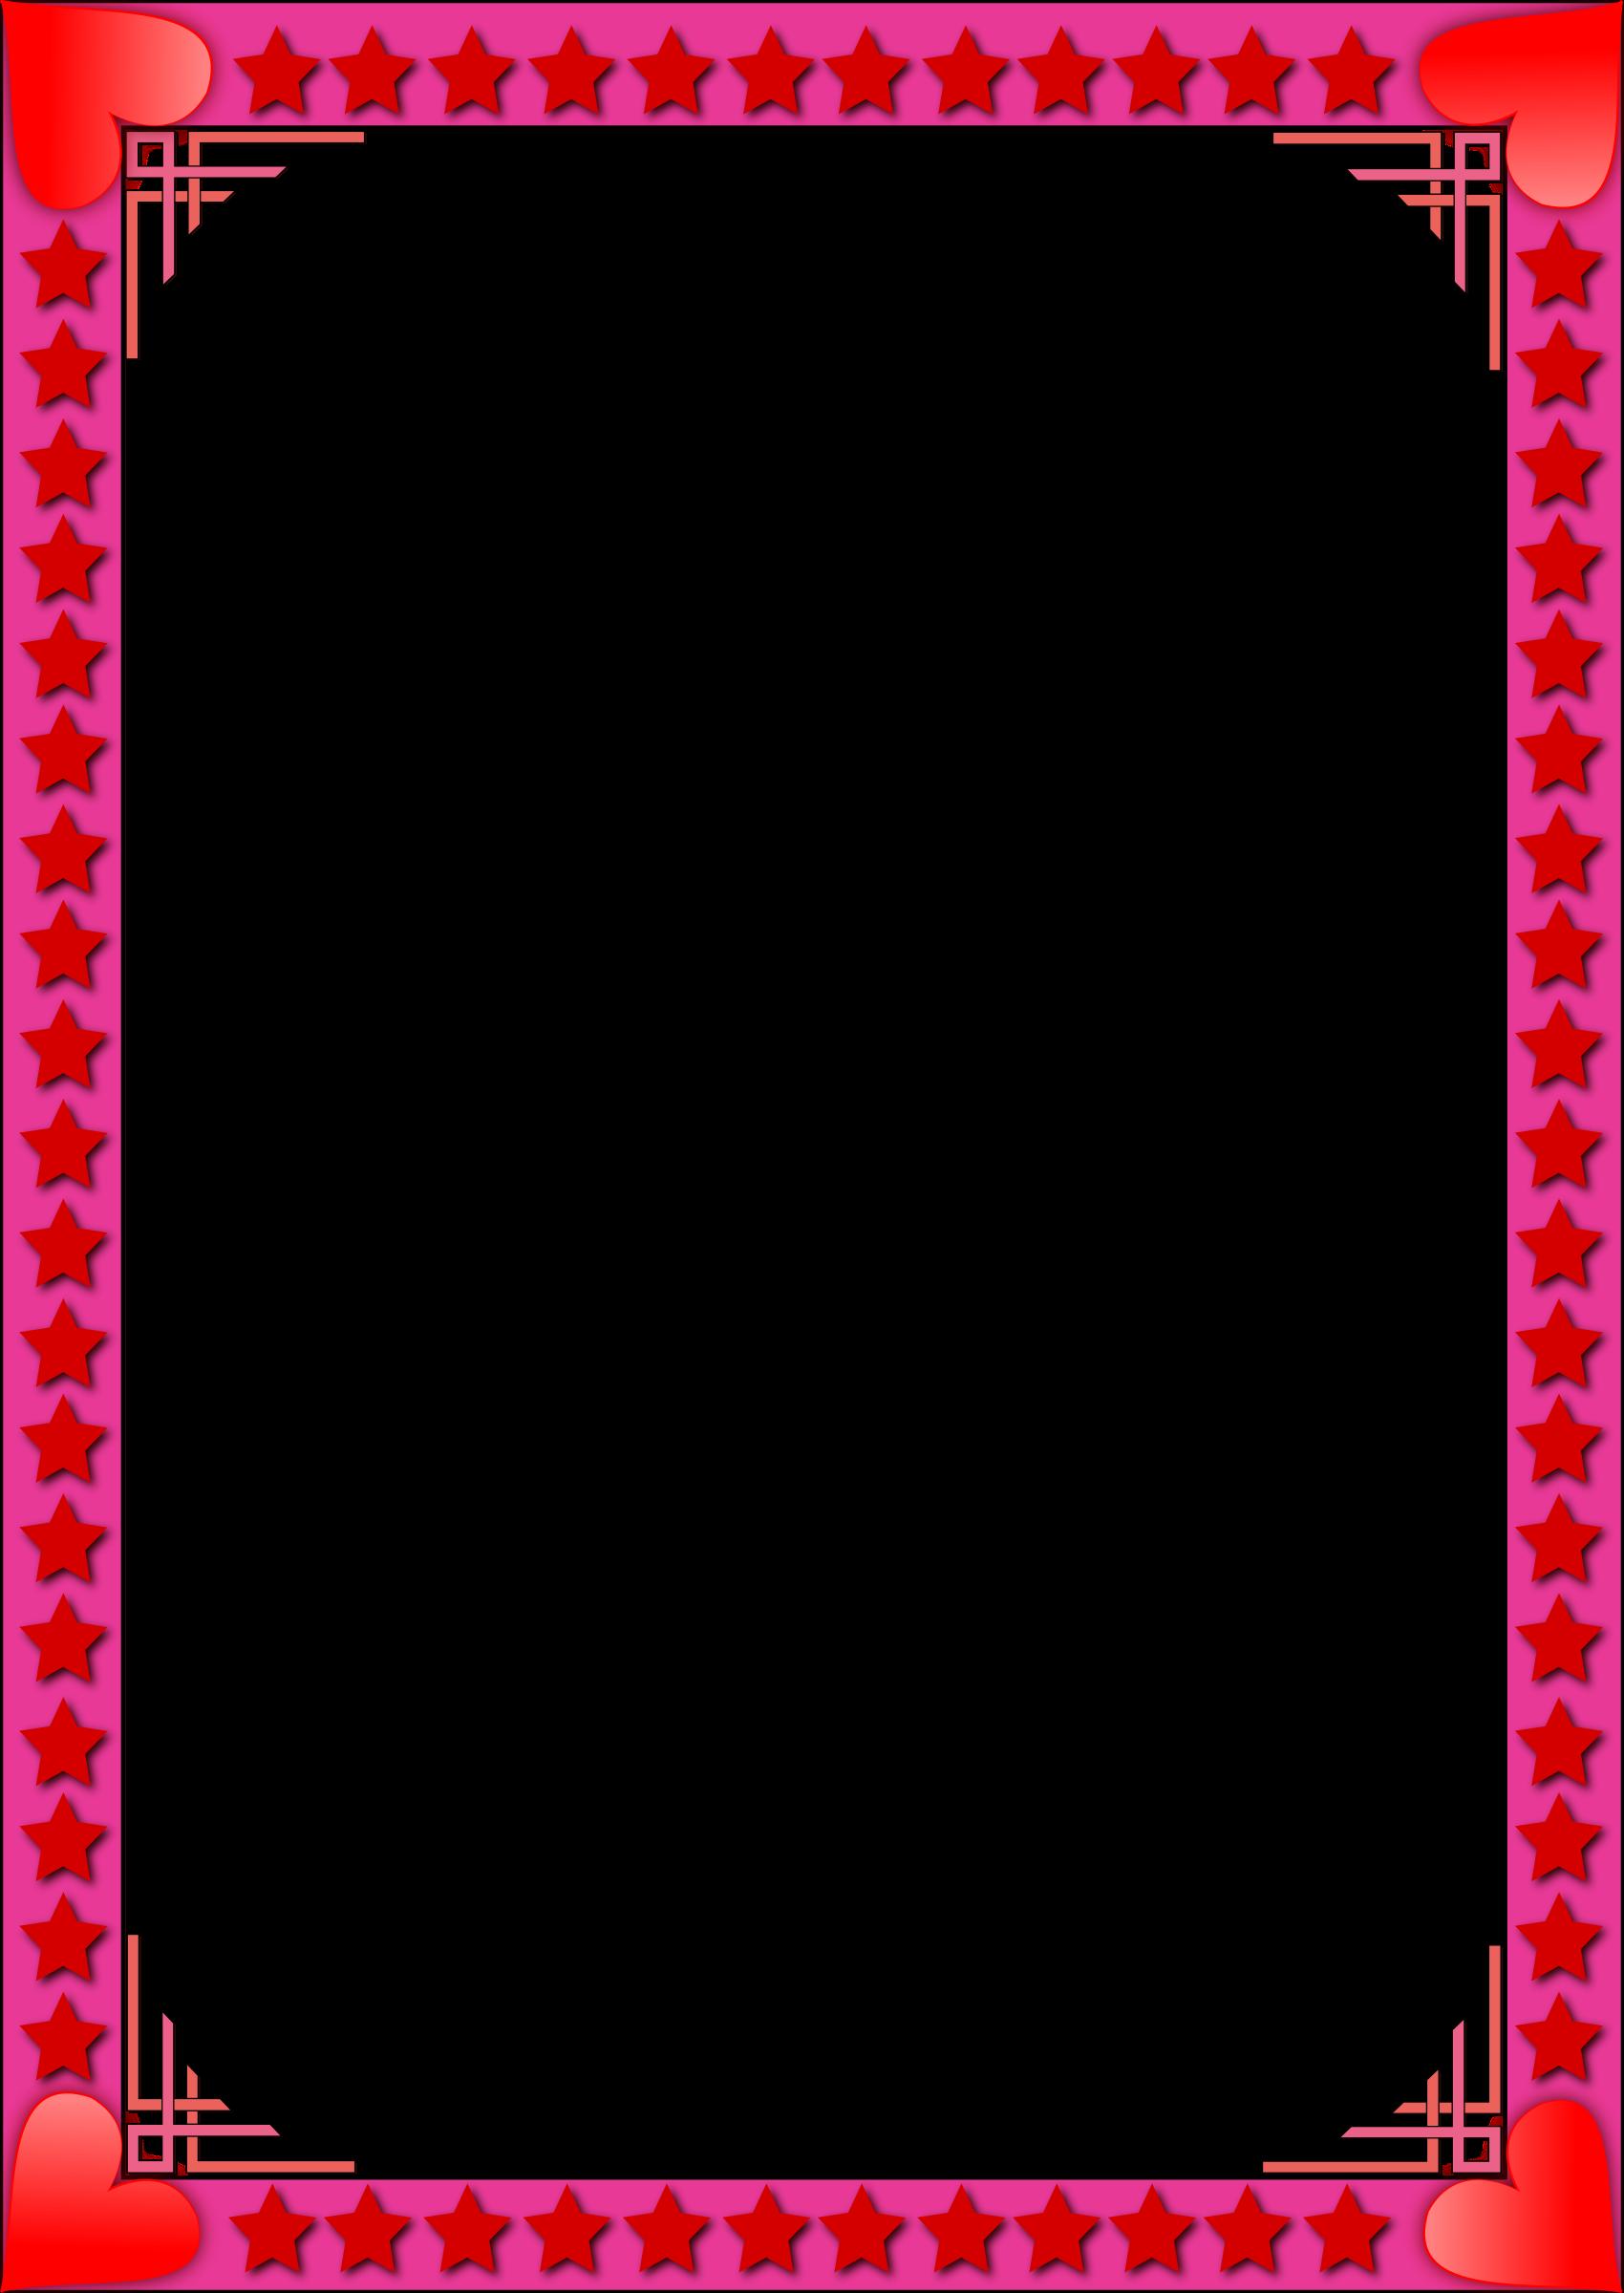 Clipart - Valentine frame